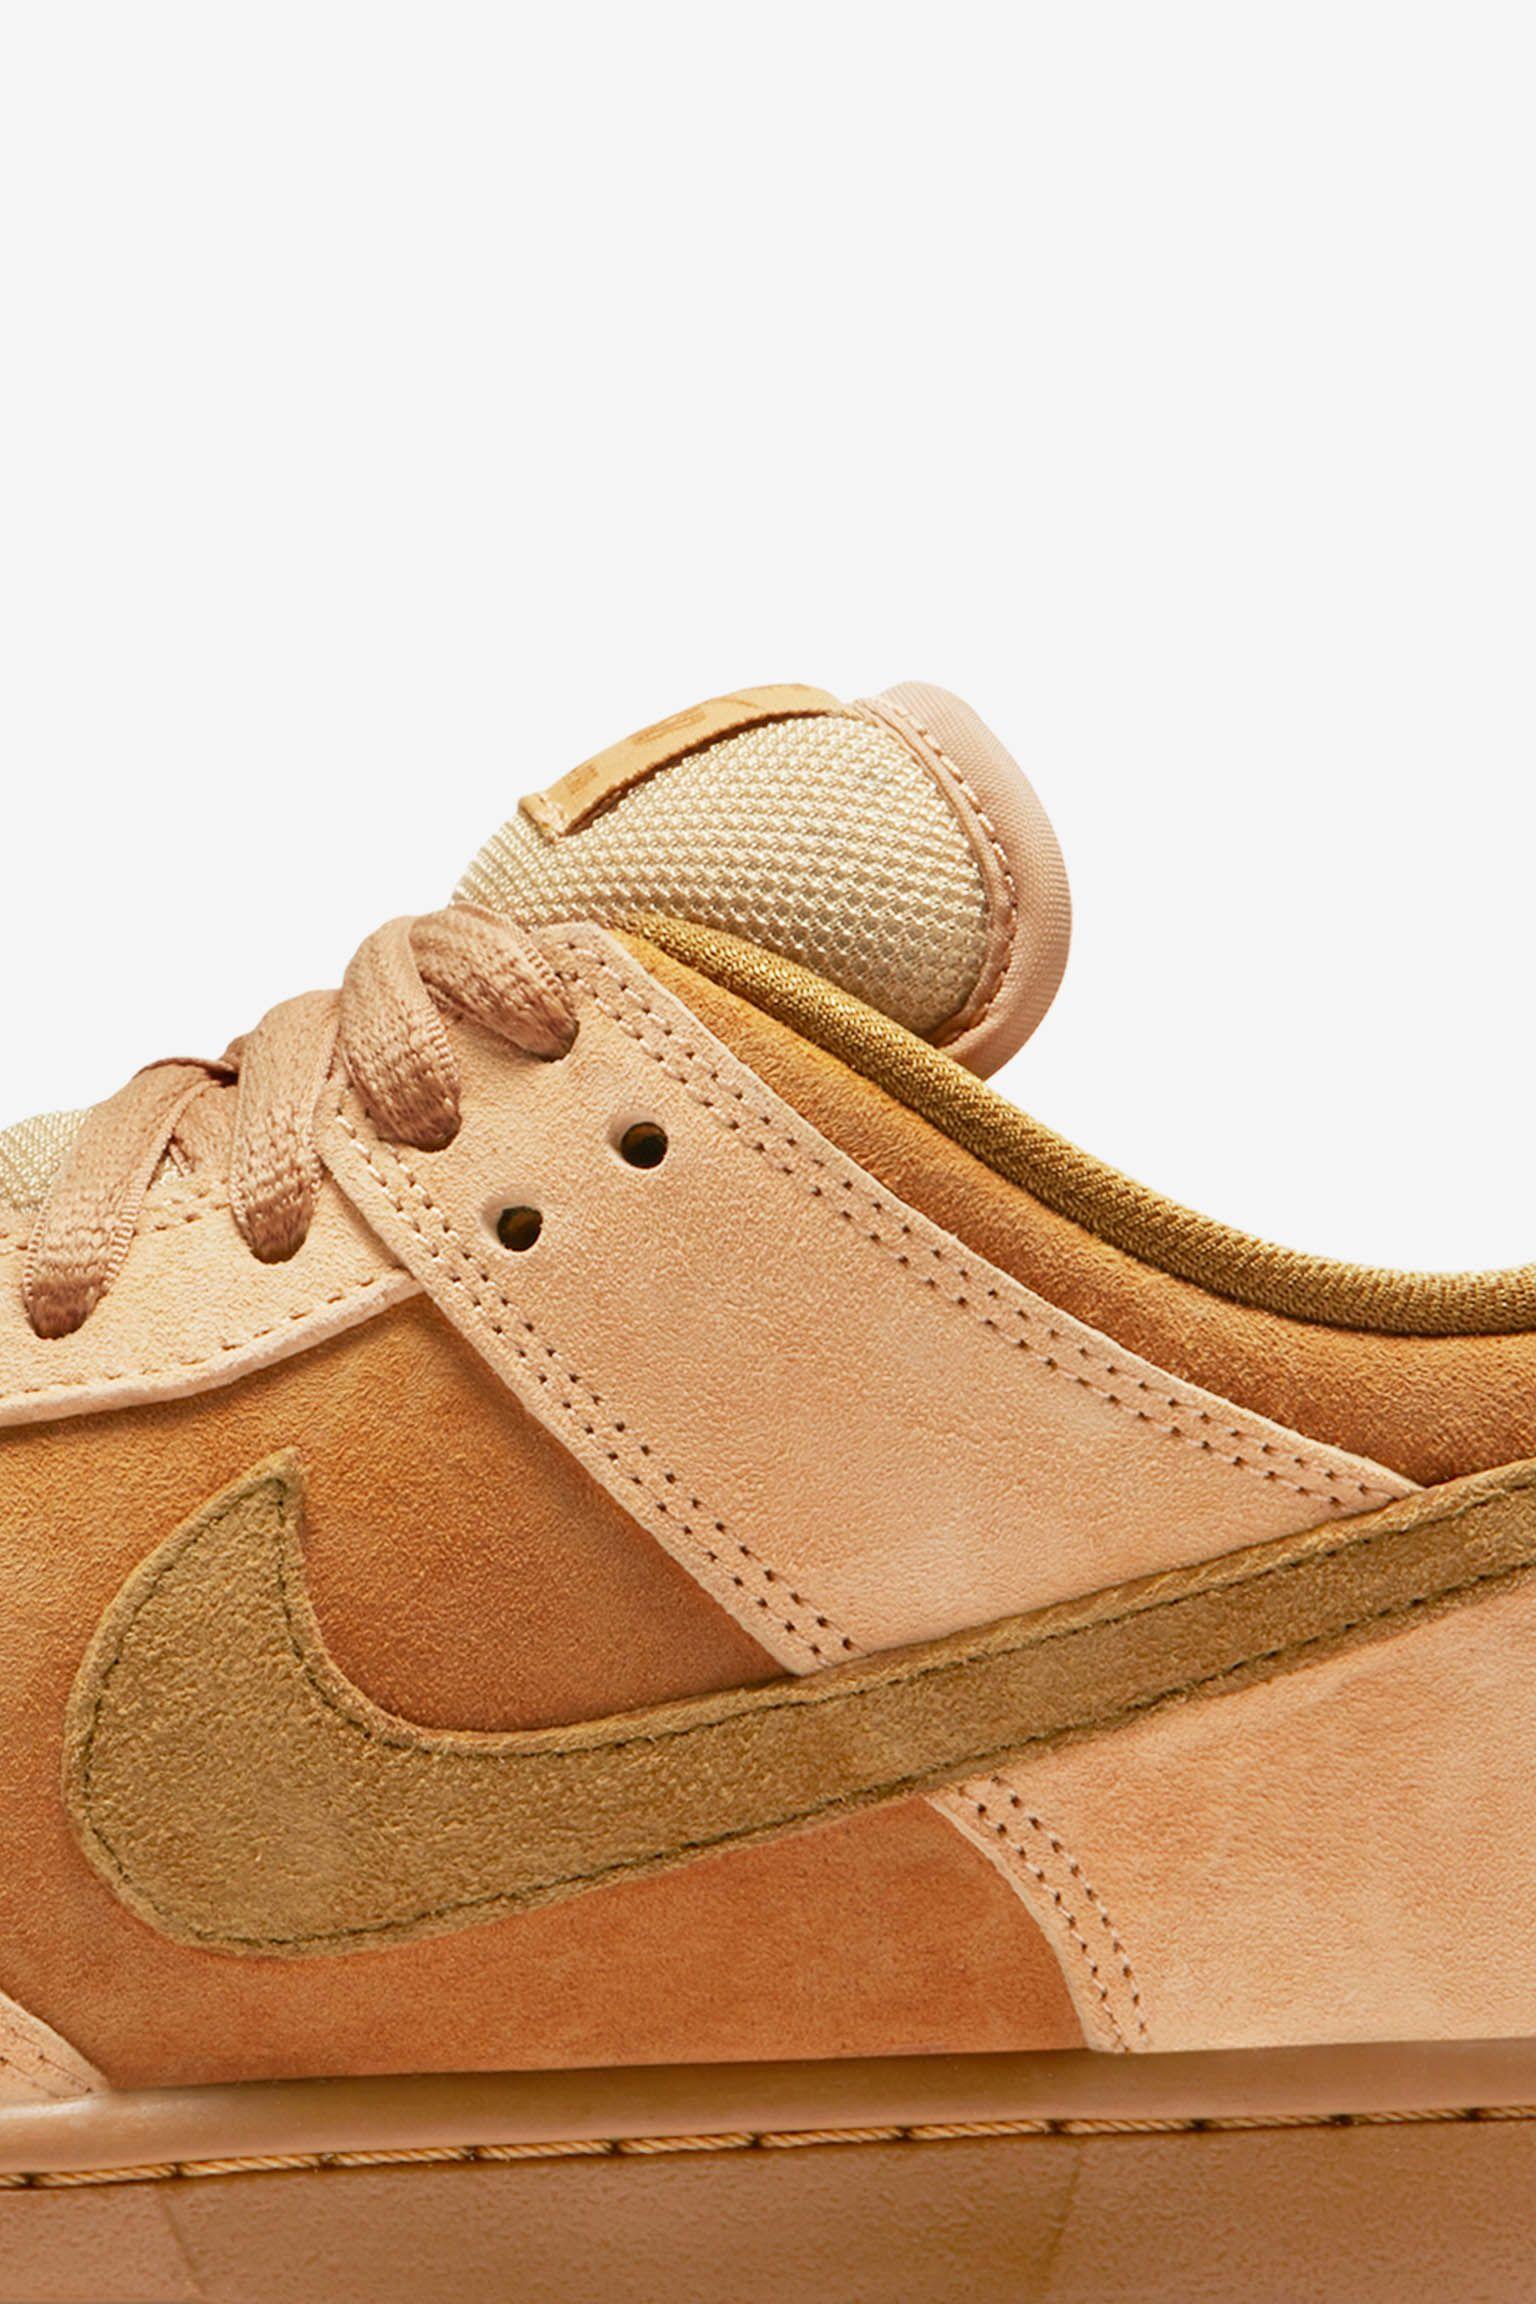 Nike SB Dunk Low Pro  Wheat  Release Date. Nike+ SNKRS 251805e6ece4